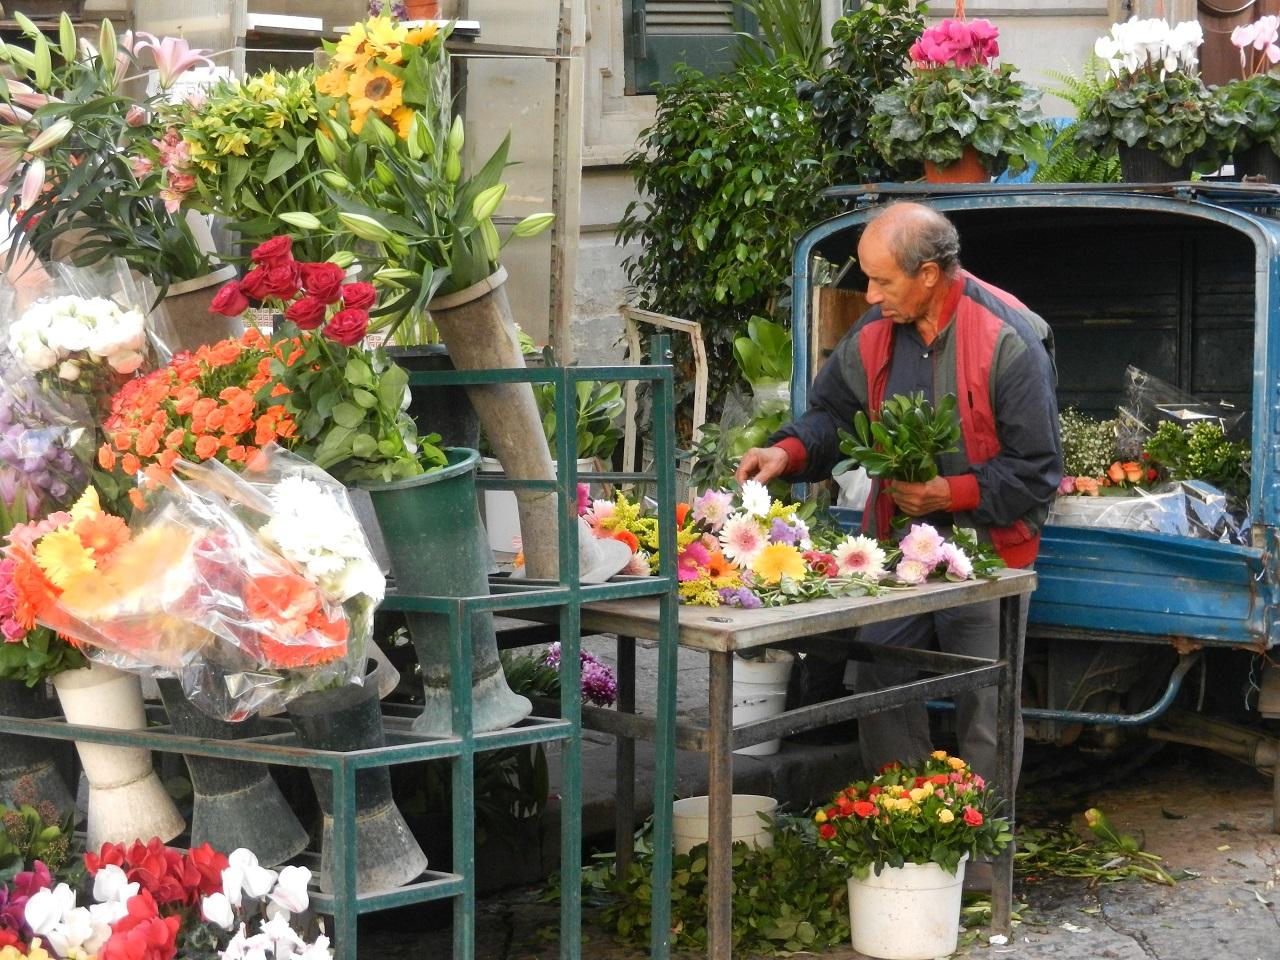 A Flower Vendor in Naples